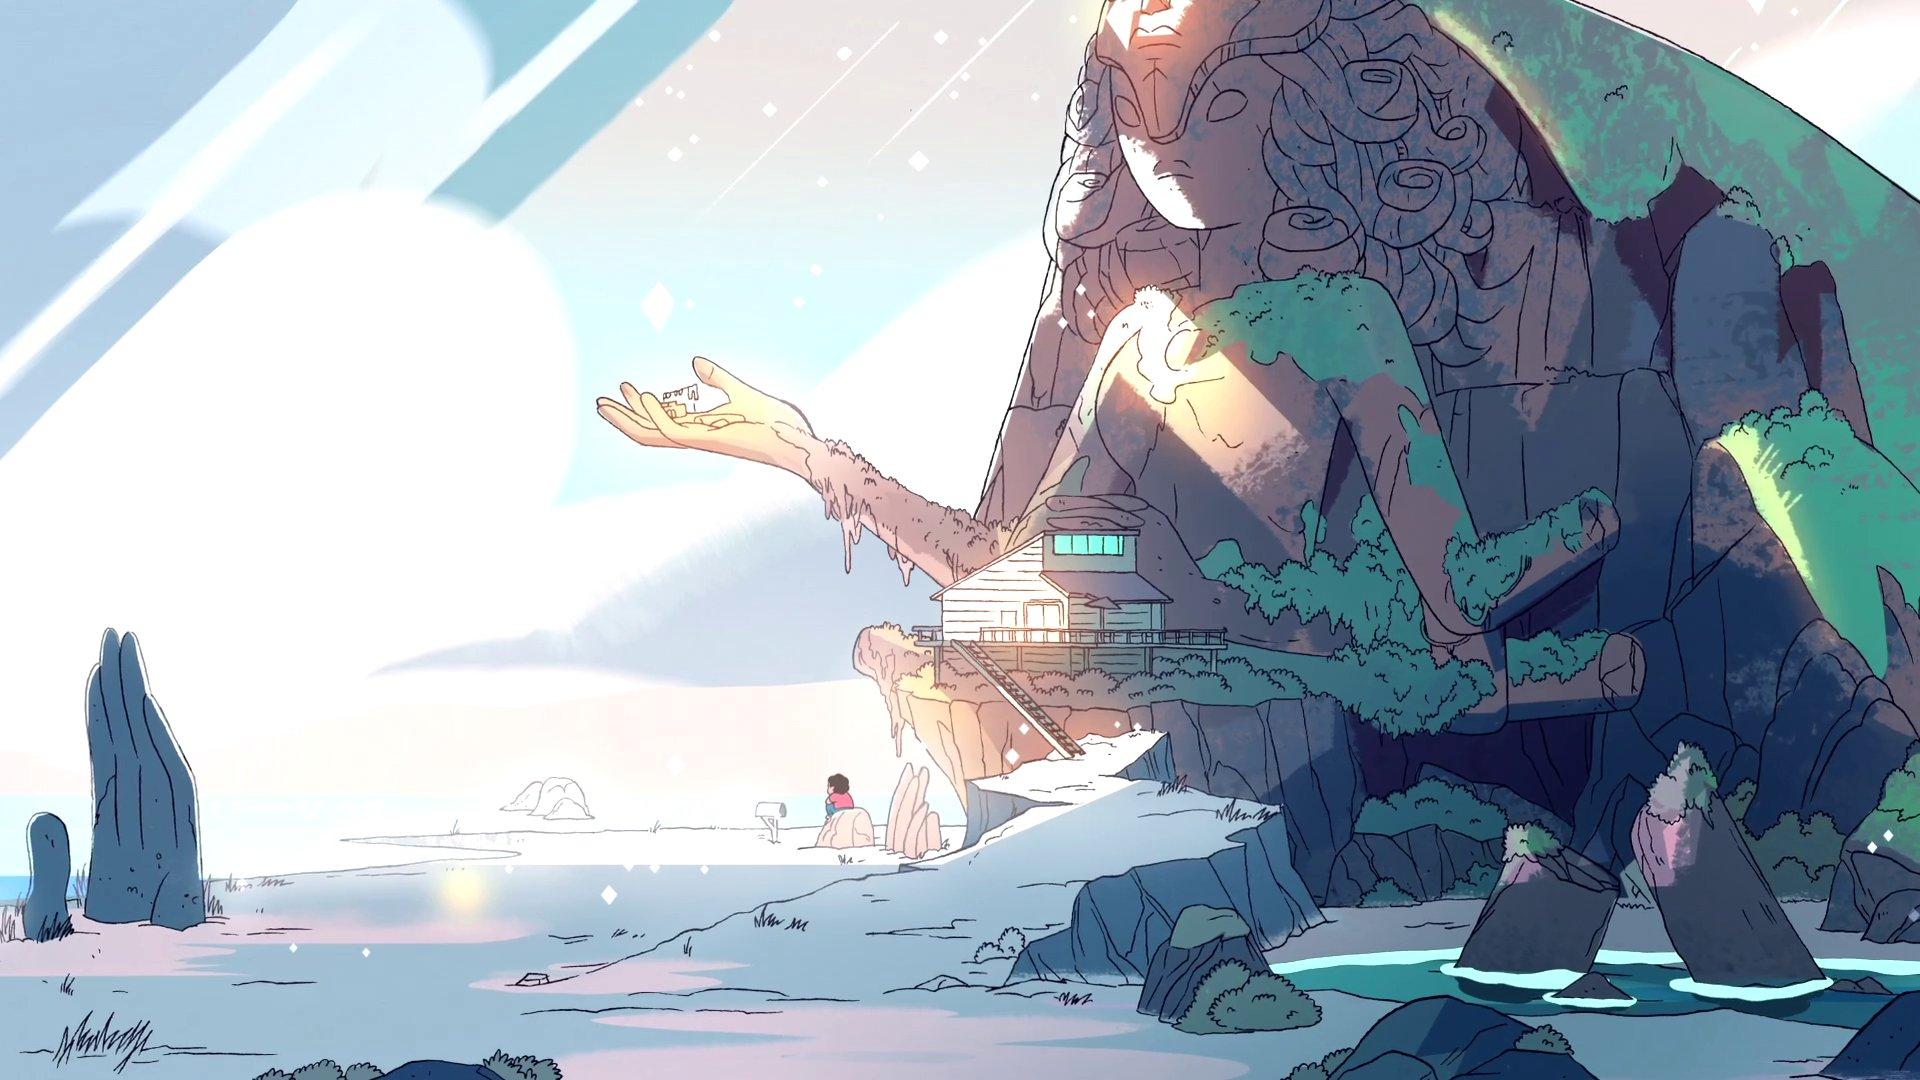 [100+] Steven Universe Wallpapers on WallpaperSafari